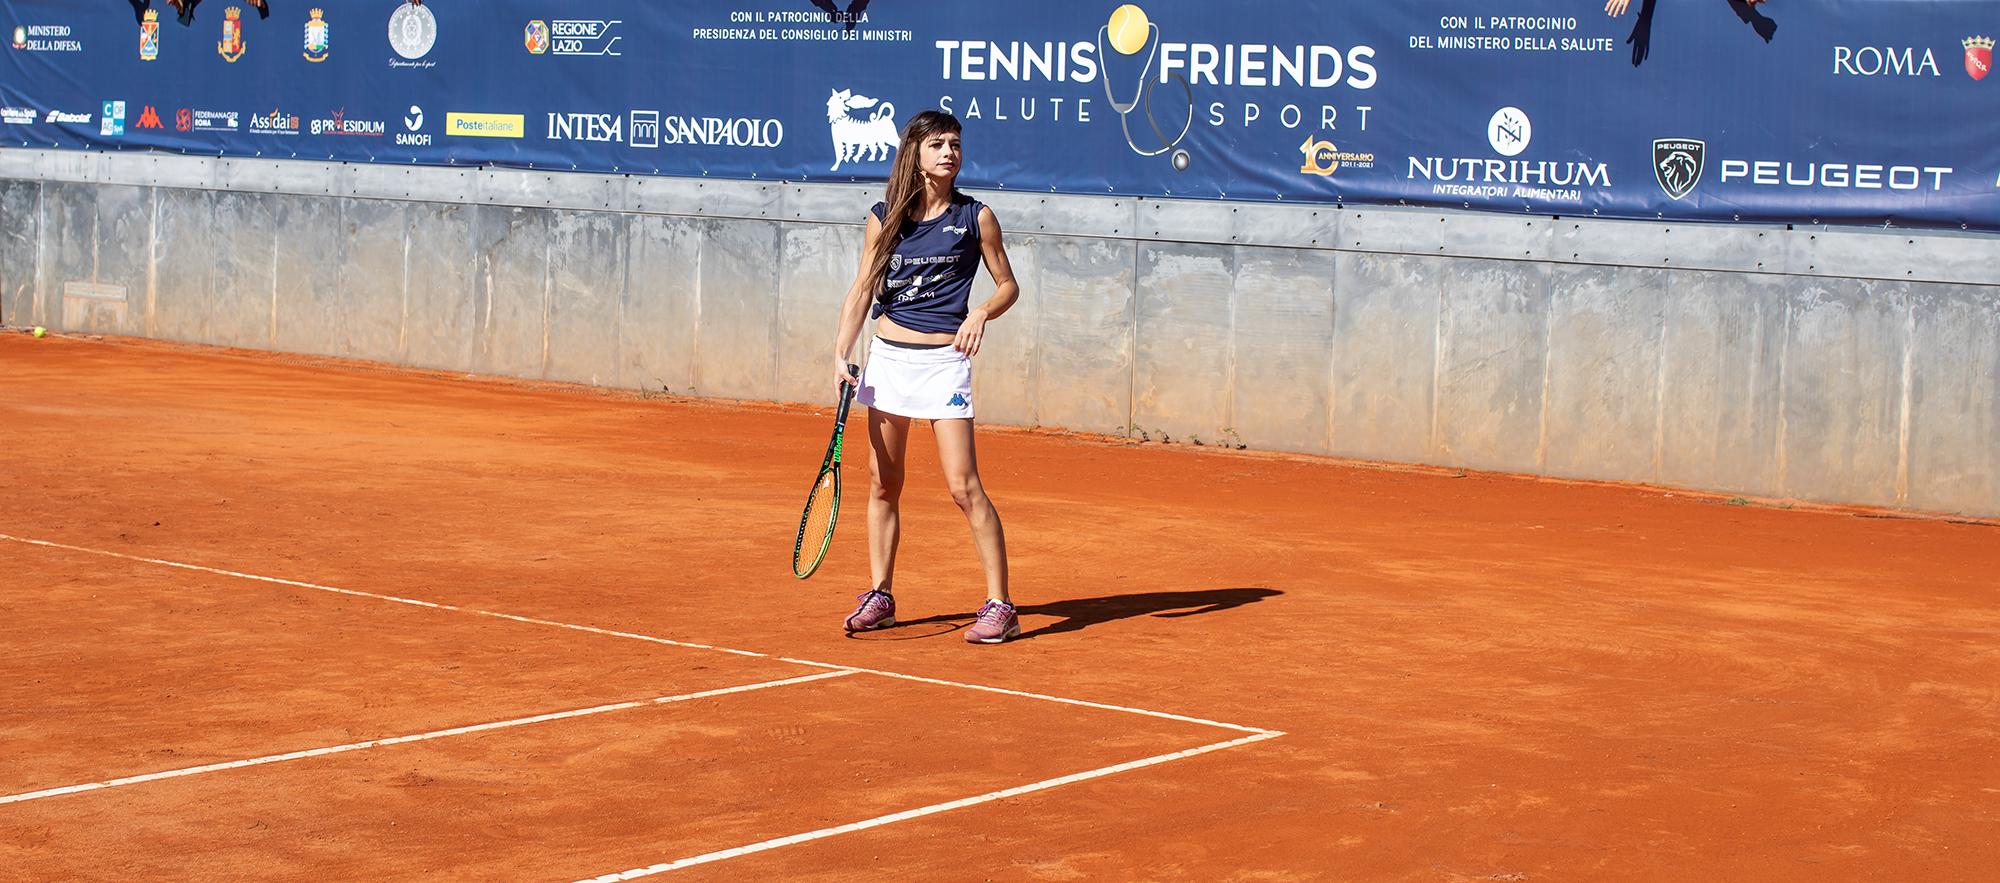 @manudolcenera - #tennisandfriends